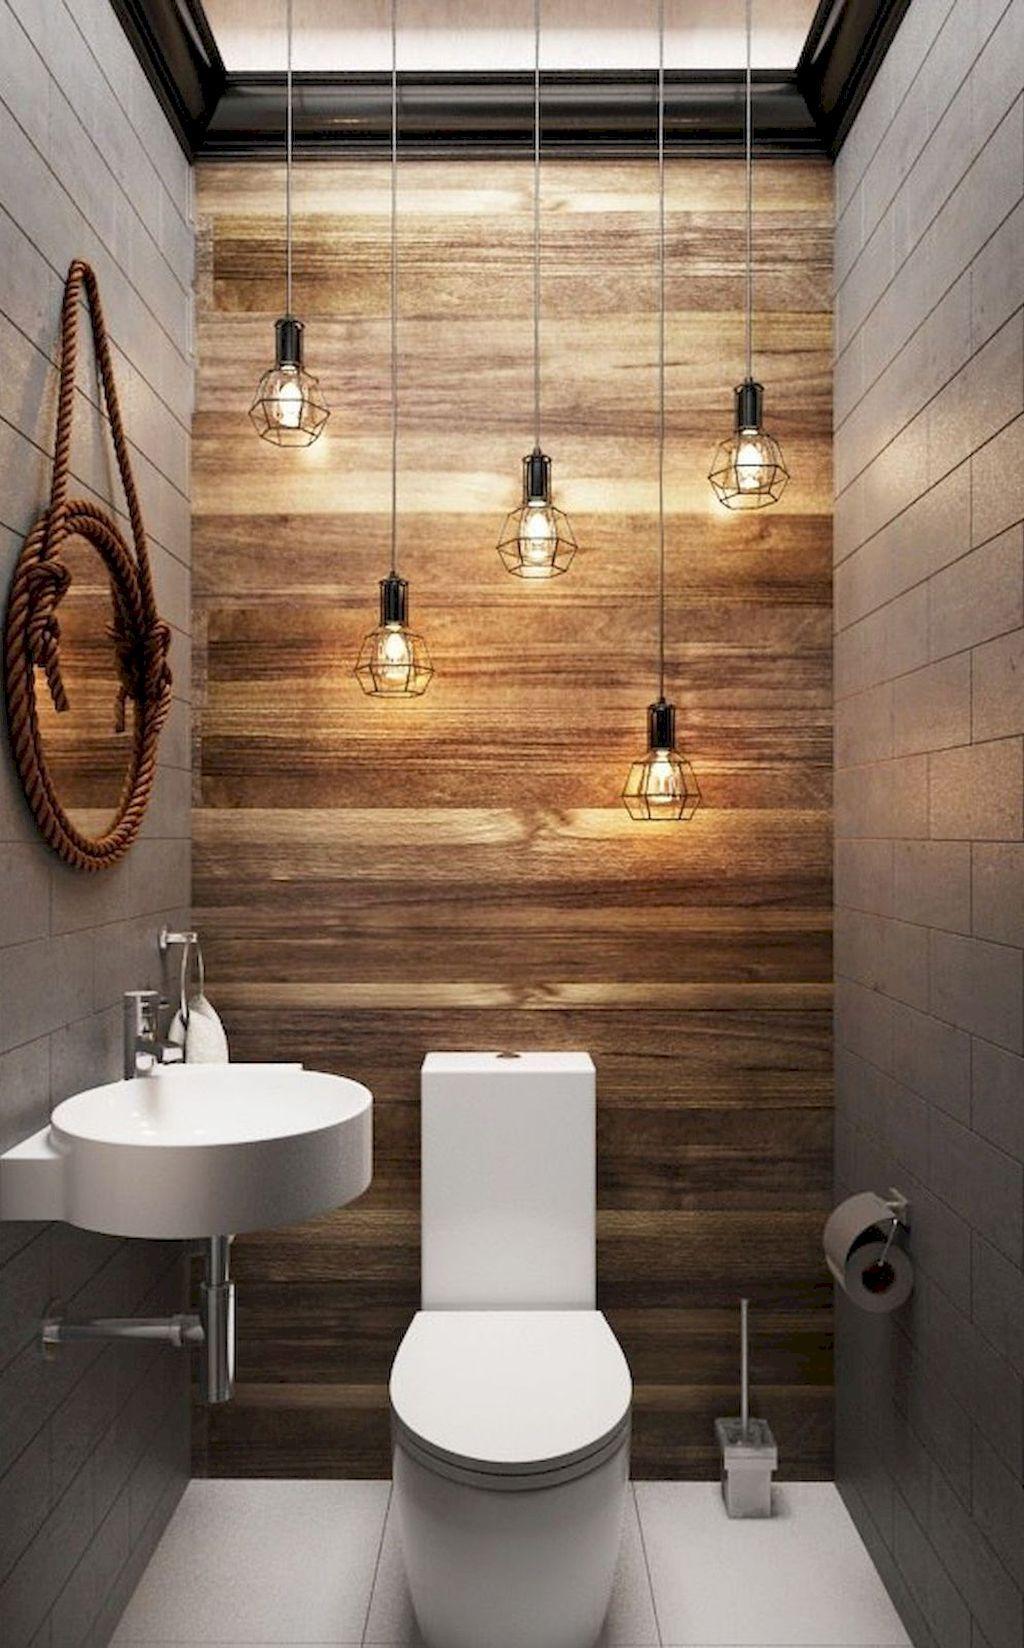 22 Ways To Boost And Refresh Your Bathroom By Adding Wood Accents: Cool 75 Modern Farmhouse Bathroom Decor Ideas Https://decorapartment.com/75-modern-farmhouse-ba